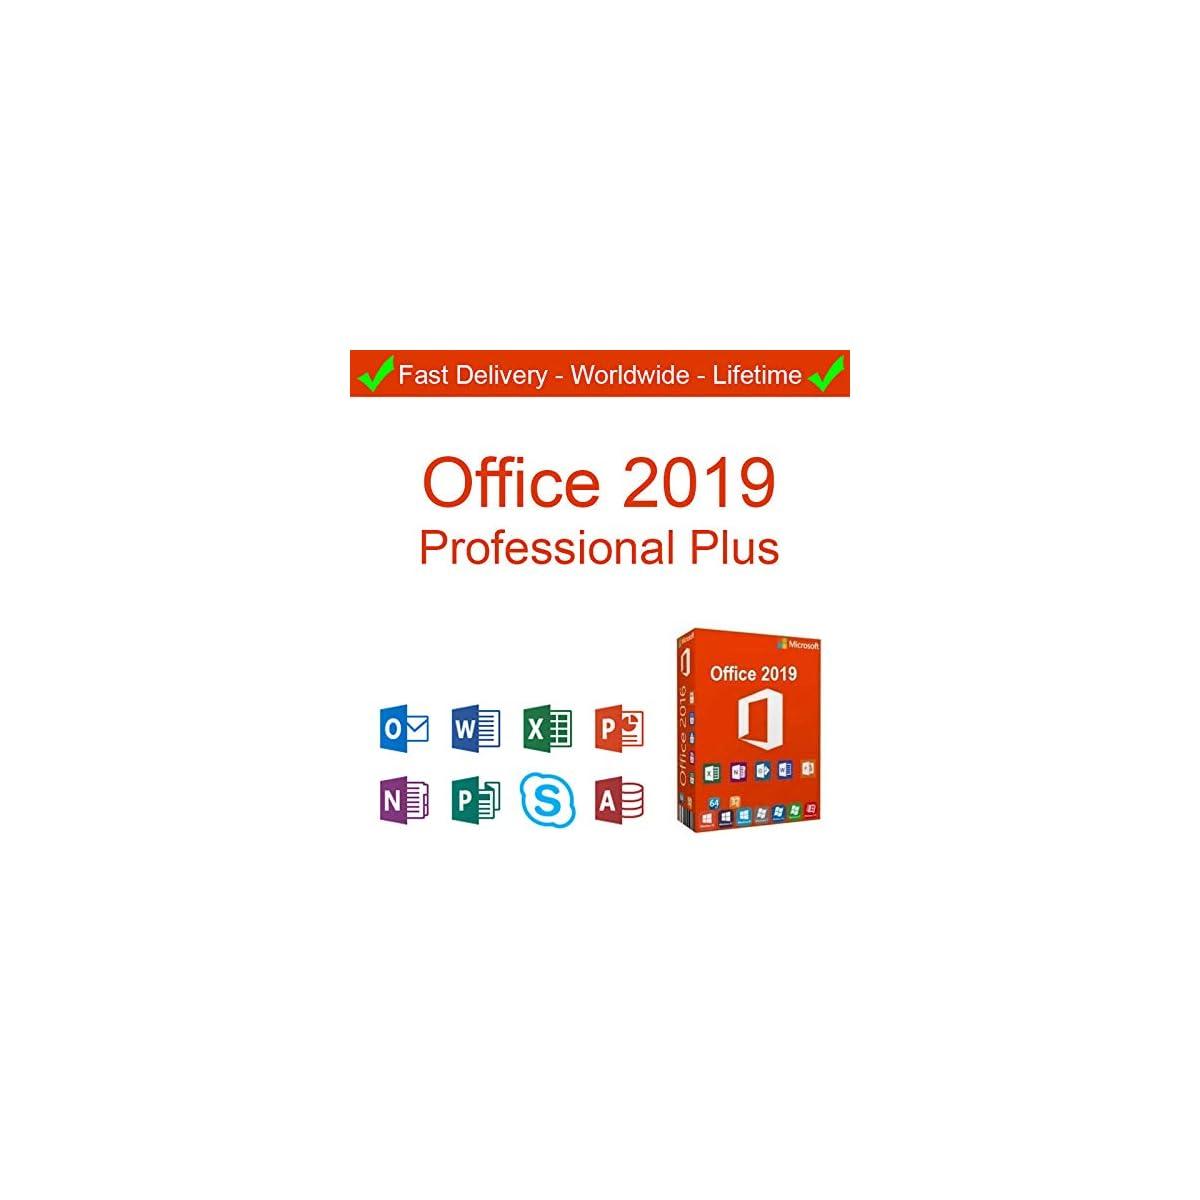 Microsoft Office 2019 Pro Plus 1 Pc Digital License Key Easy To